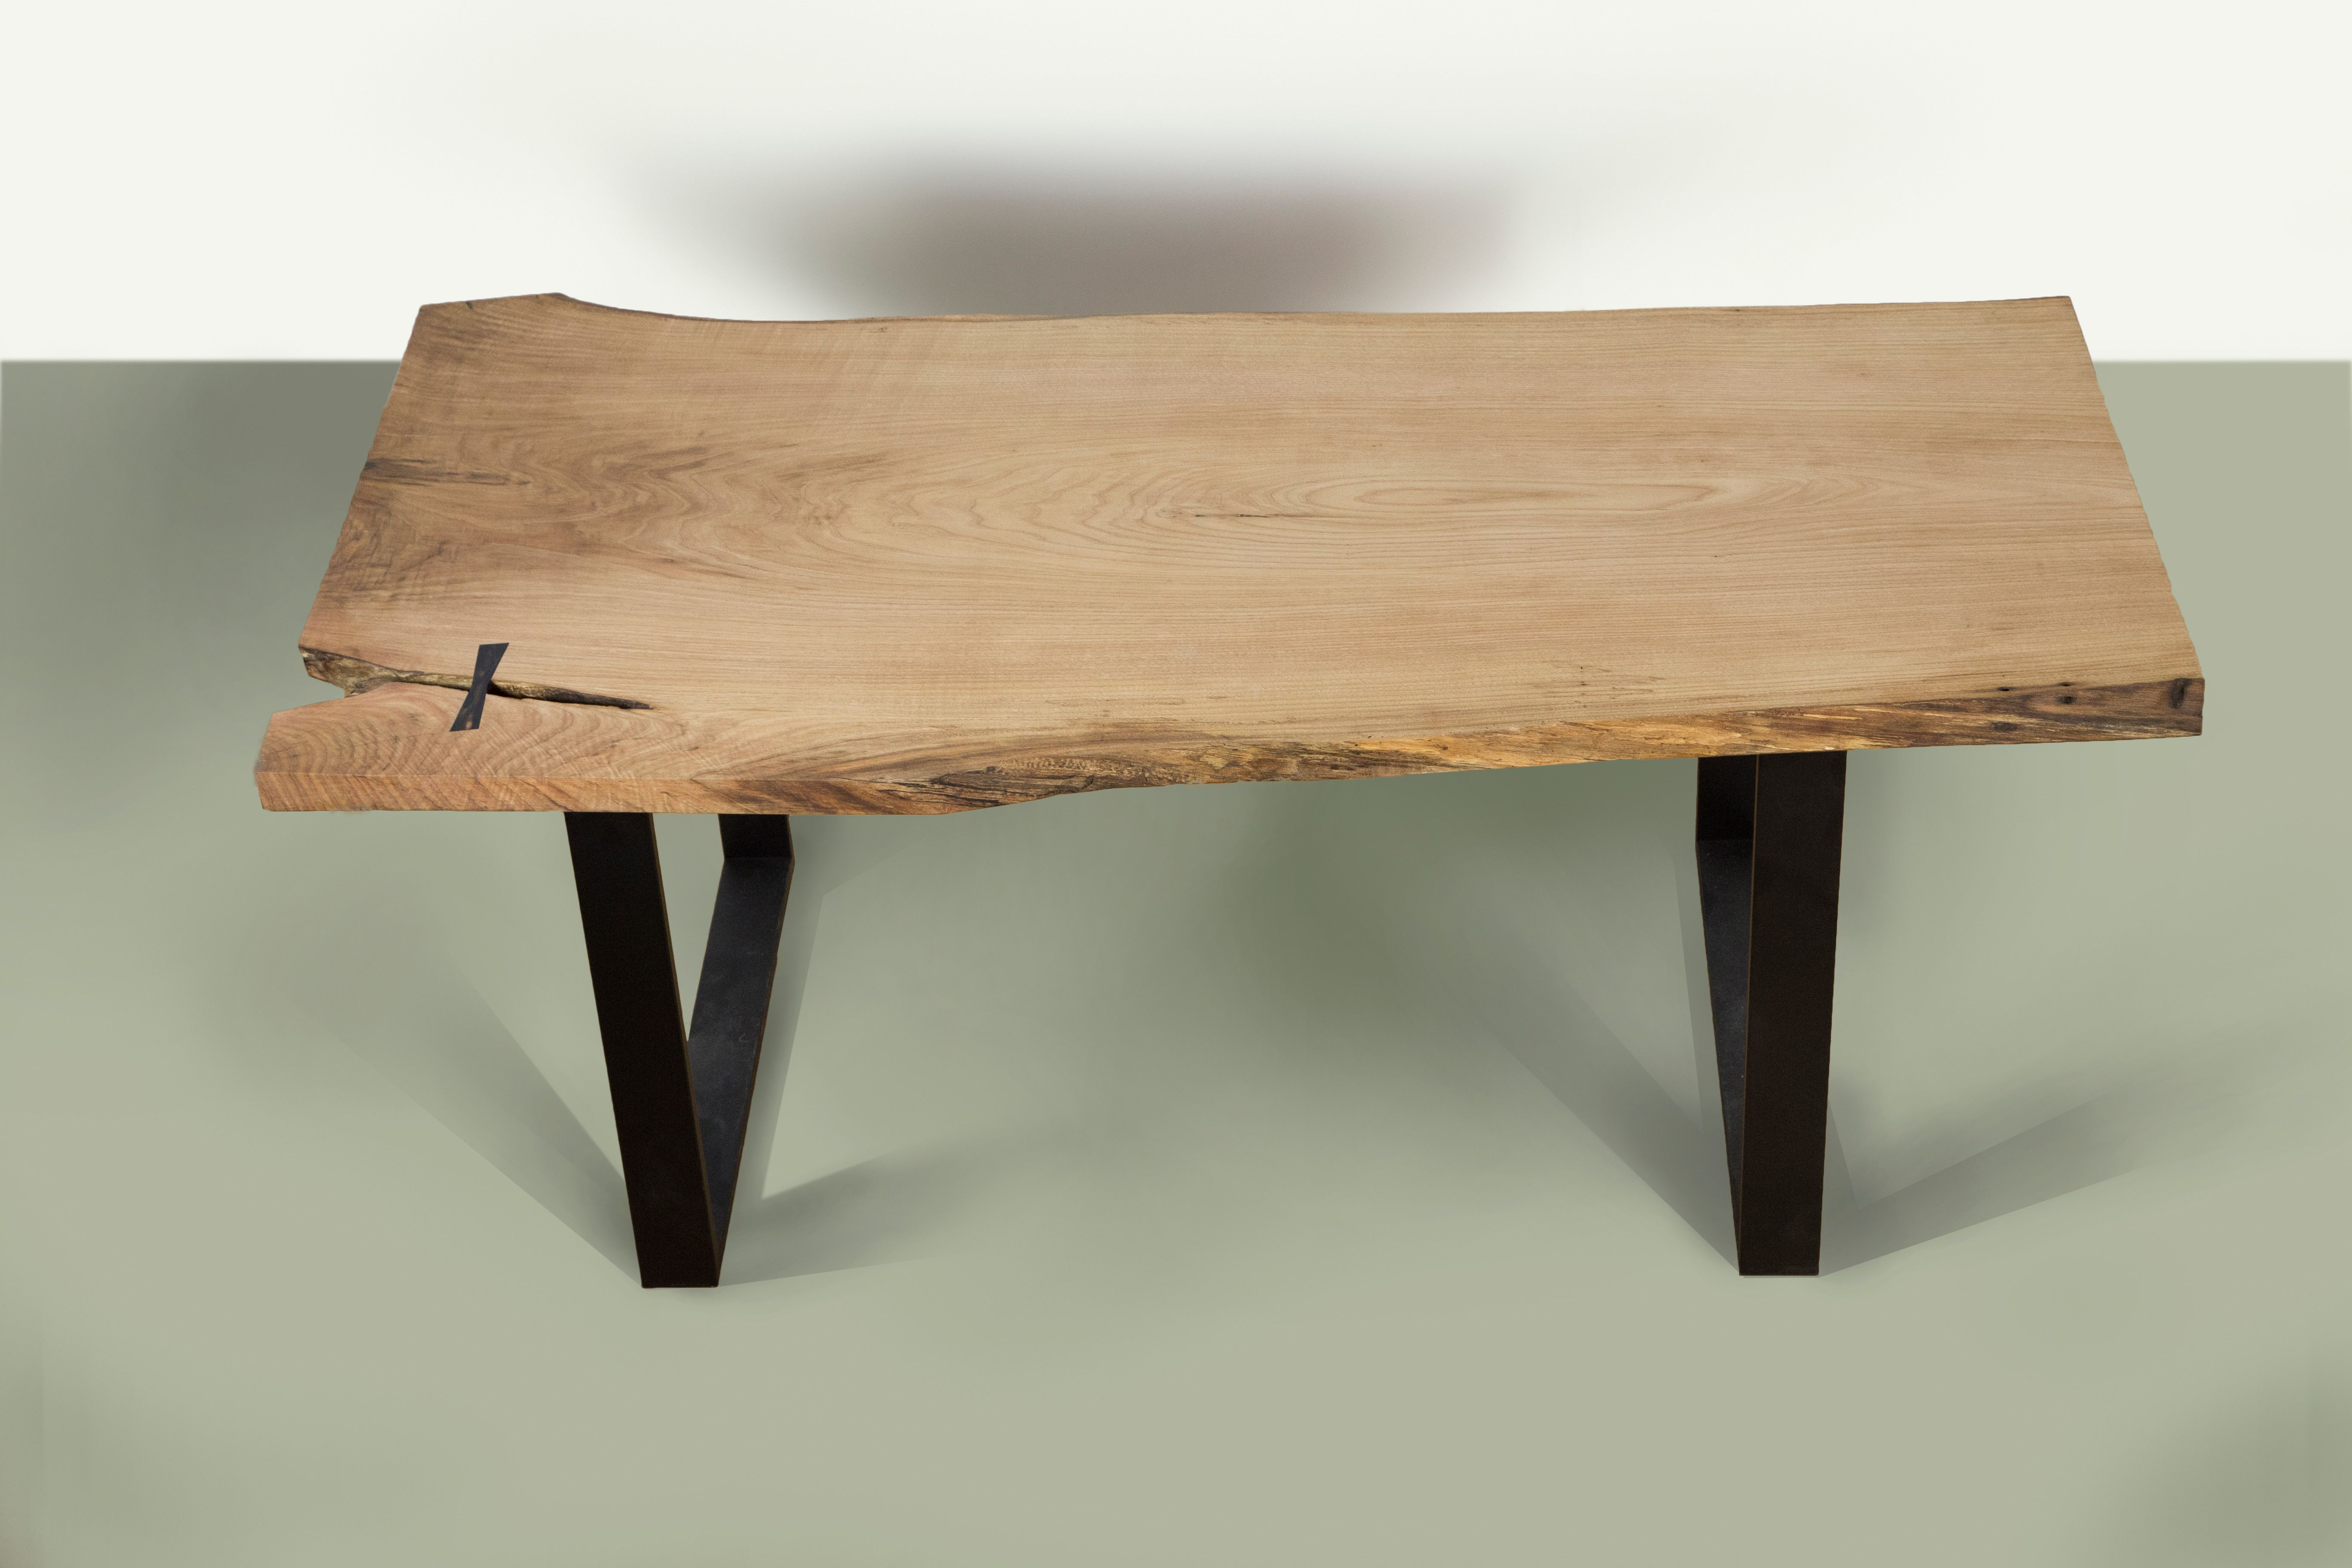 Mesa De Comedor Madera Borde Vivo Casta O Jose Chafer  # Sequoia Muebles De Autor